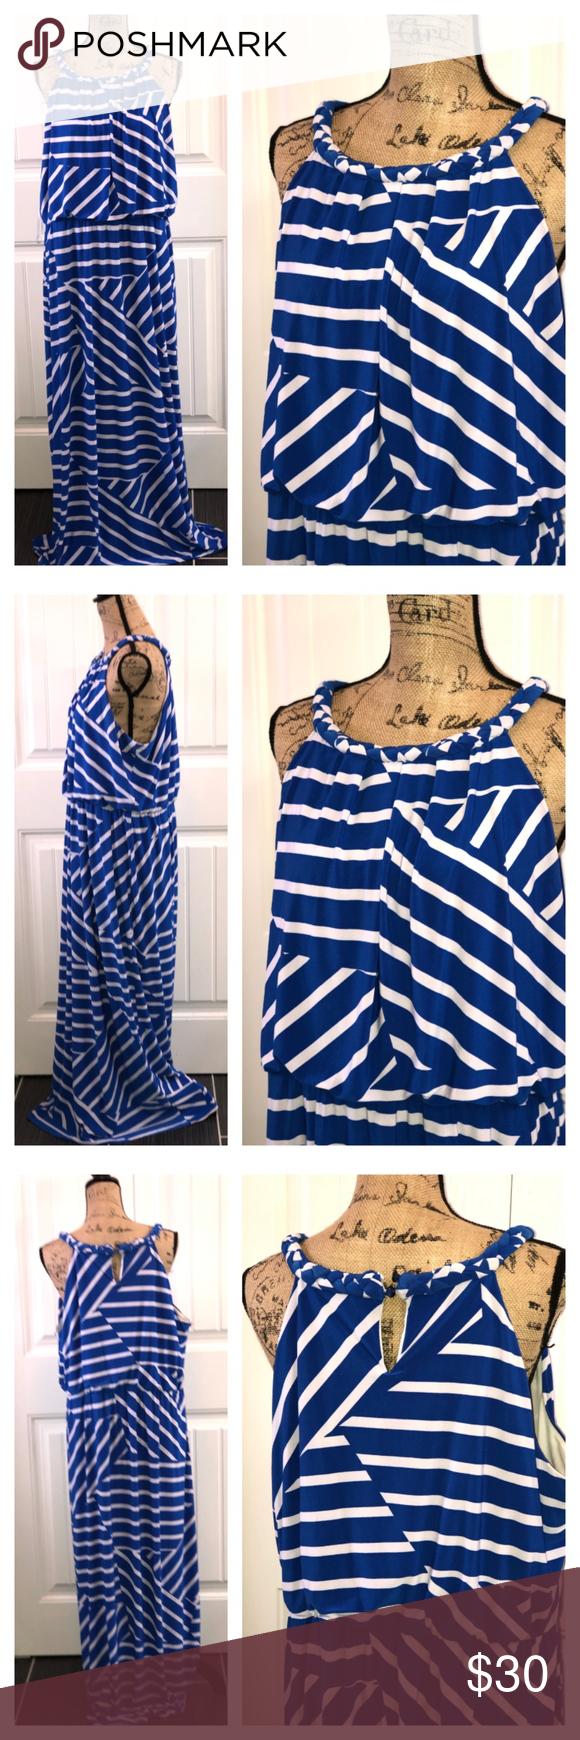 Blue White Maxi Dress Size 18 20 Maxi Dress Size 18 Blue White Maxi Dress White Maxi Dresses [ 1740 x 580 Pixel ]